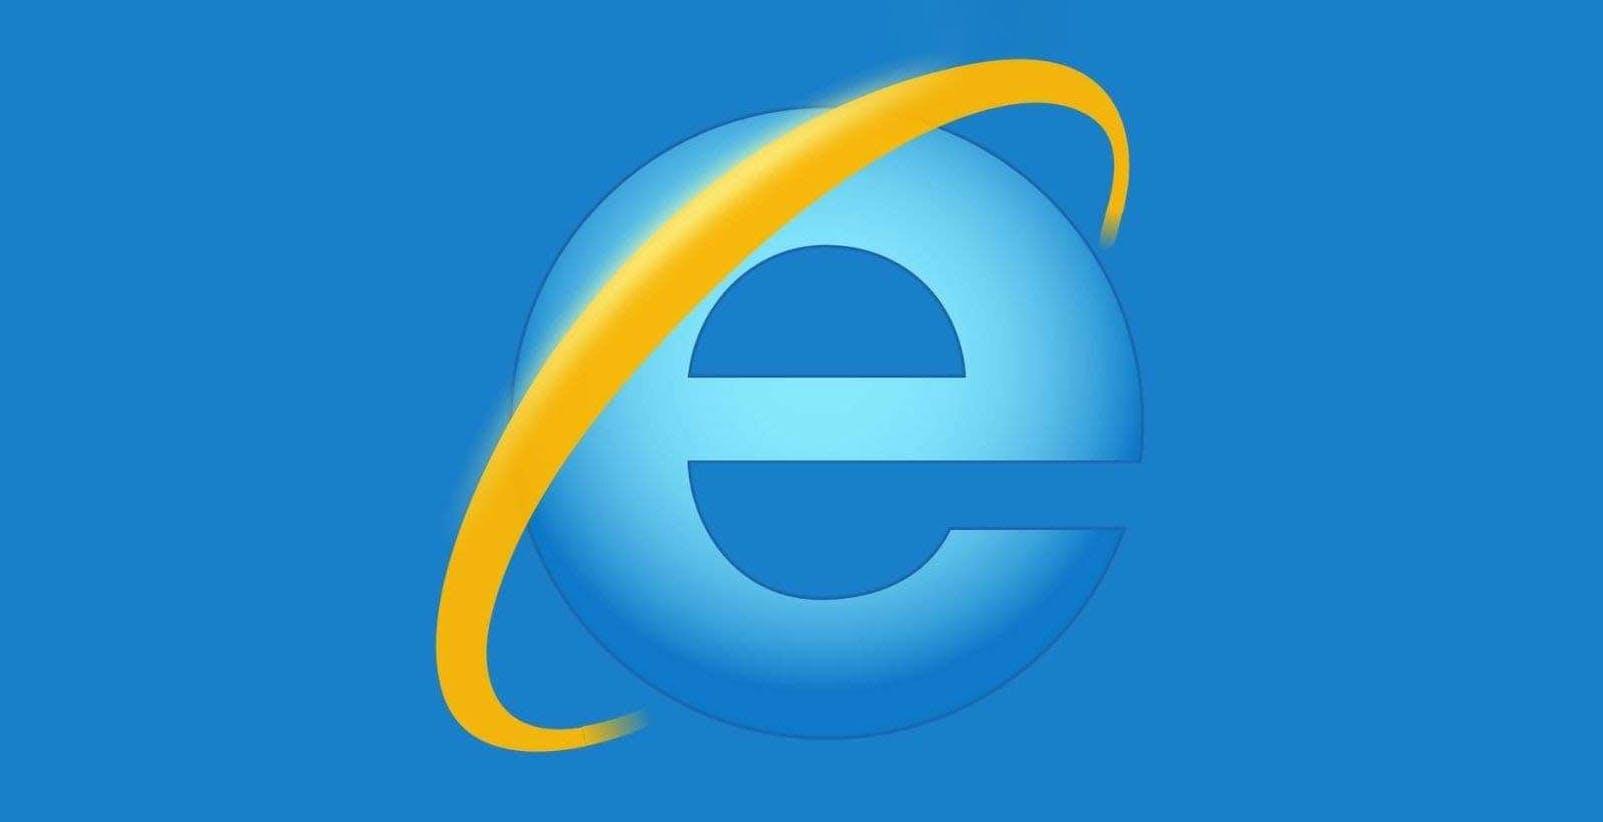 Microsoft abbandonerà Internet Explorer nel 2022